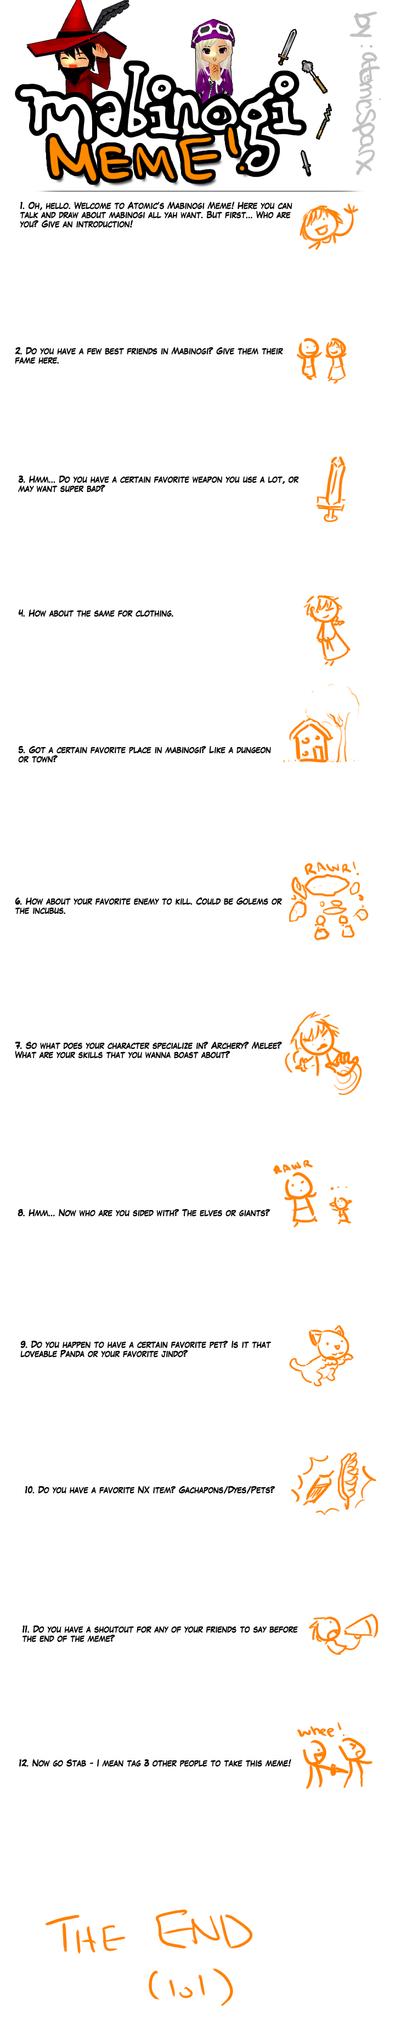 Atomic's Mabinogi Meme by CursedGuitar